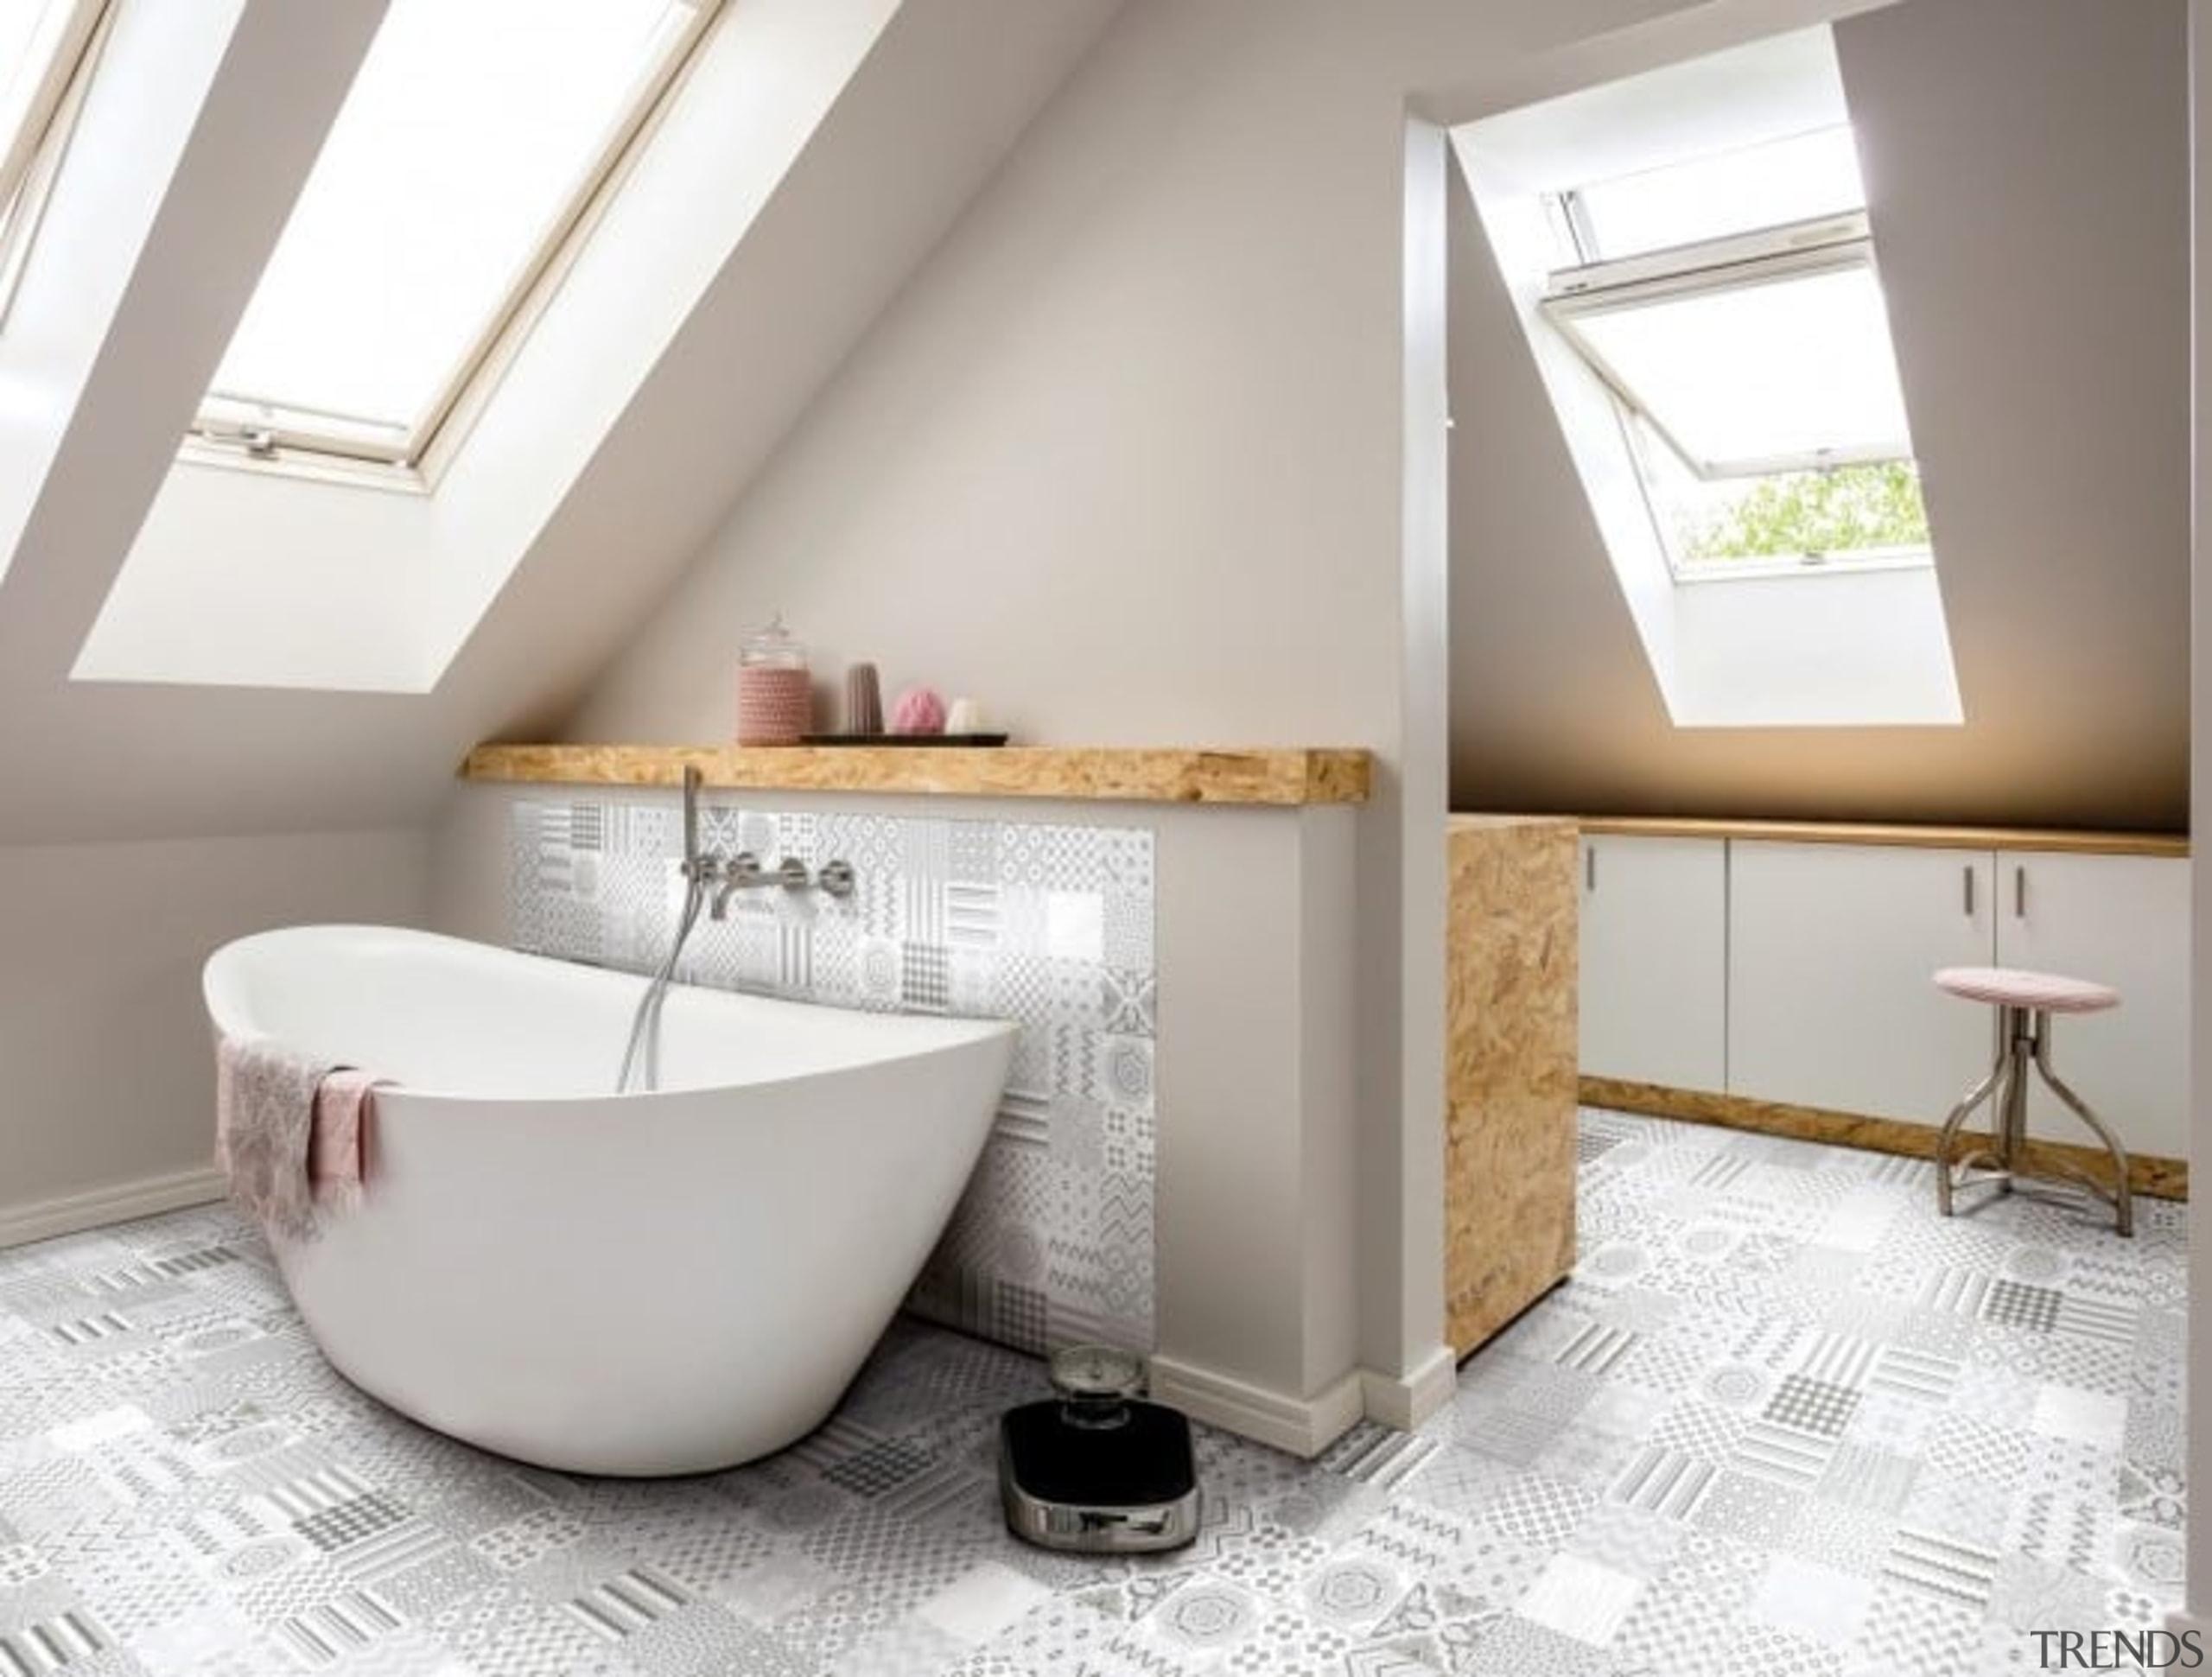 Graphite Dusty 600x600 - Graphite Dusty 600x600 - bathroom, bathroom accessory, floor, interior design, plumbing fixture, product, room, sink, tap, toilet seat, white